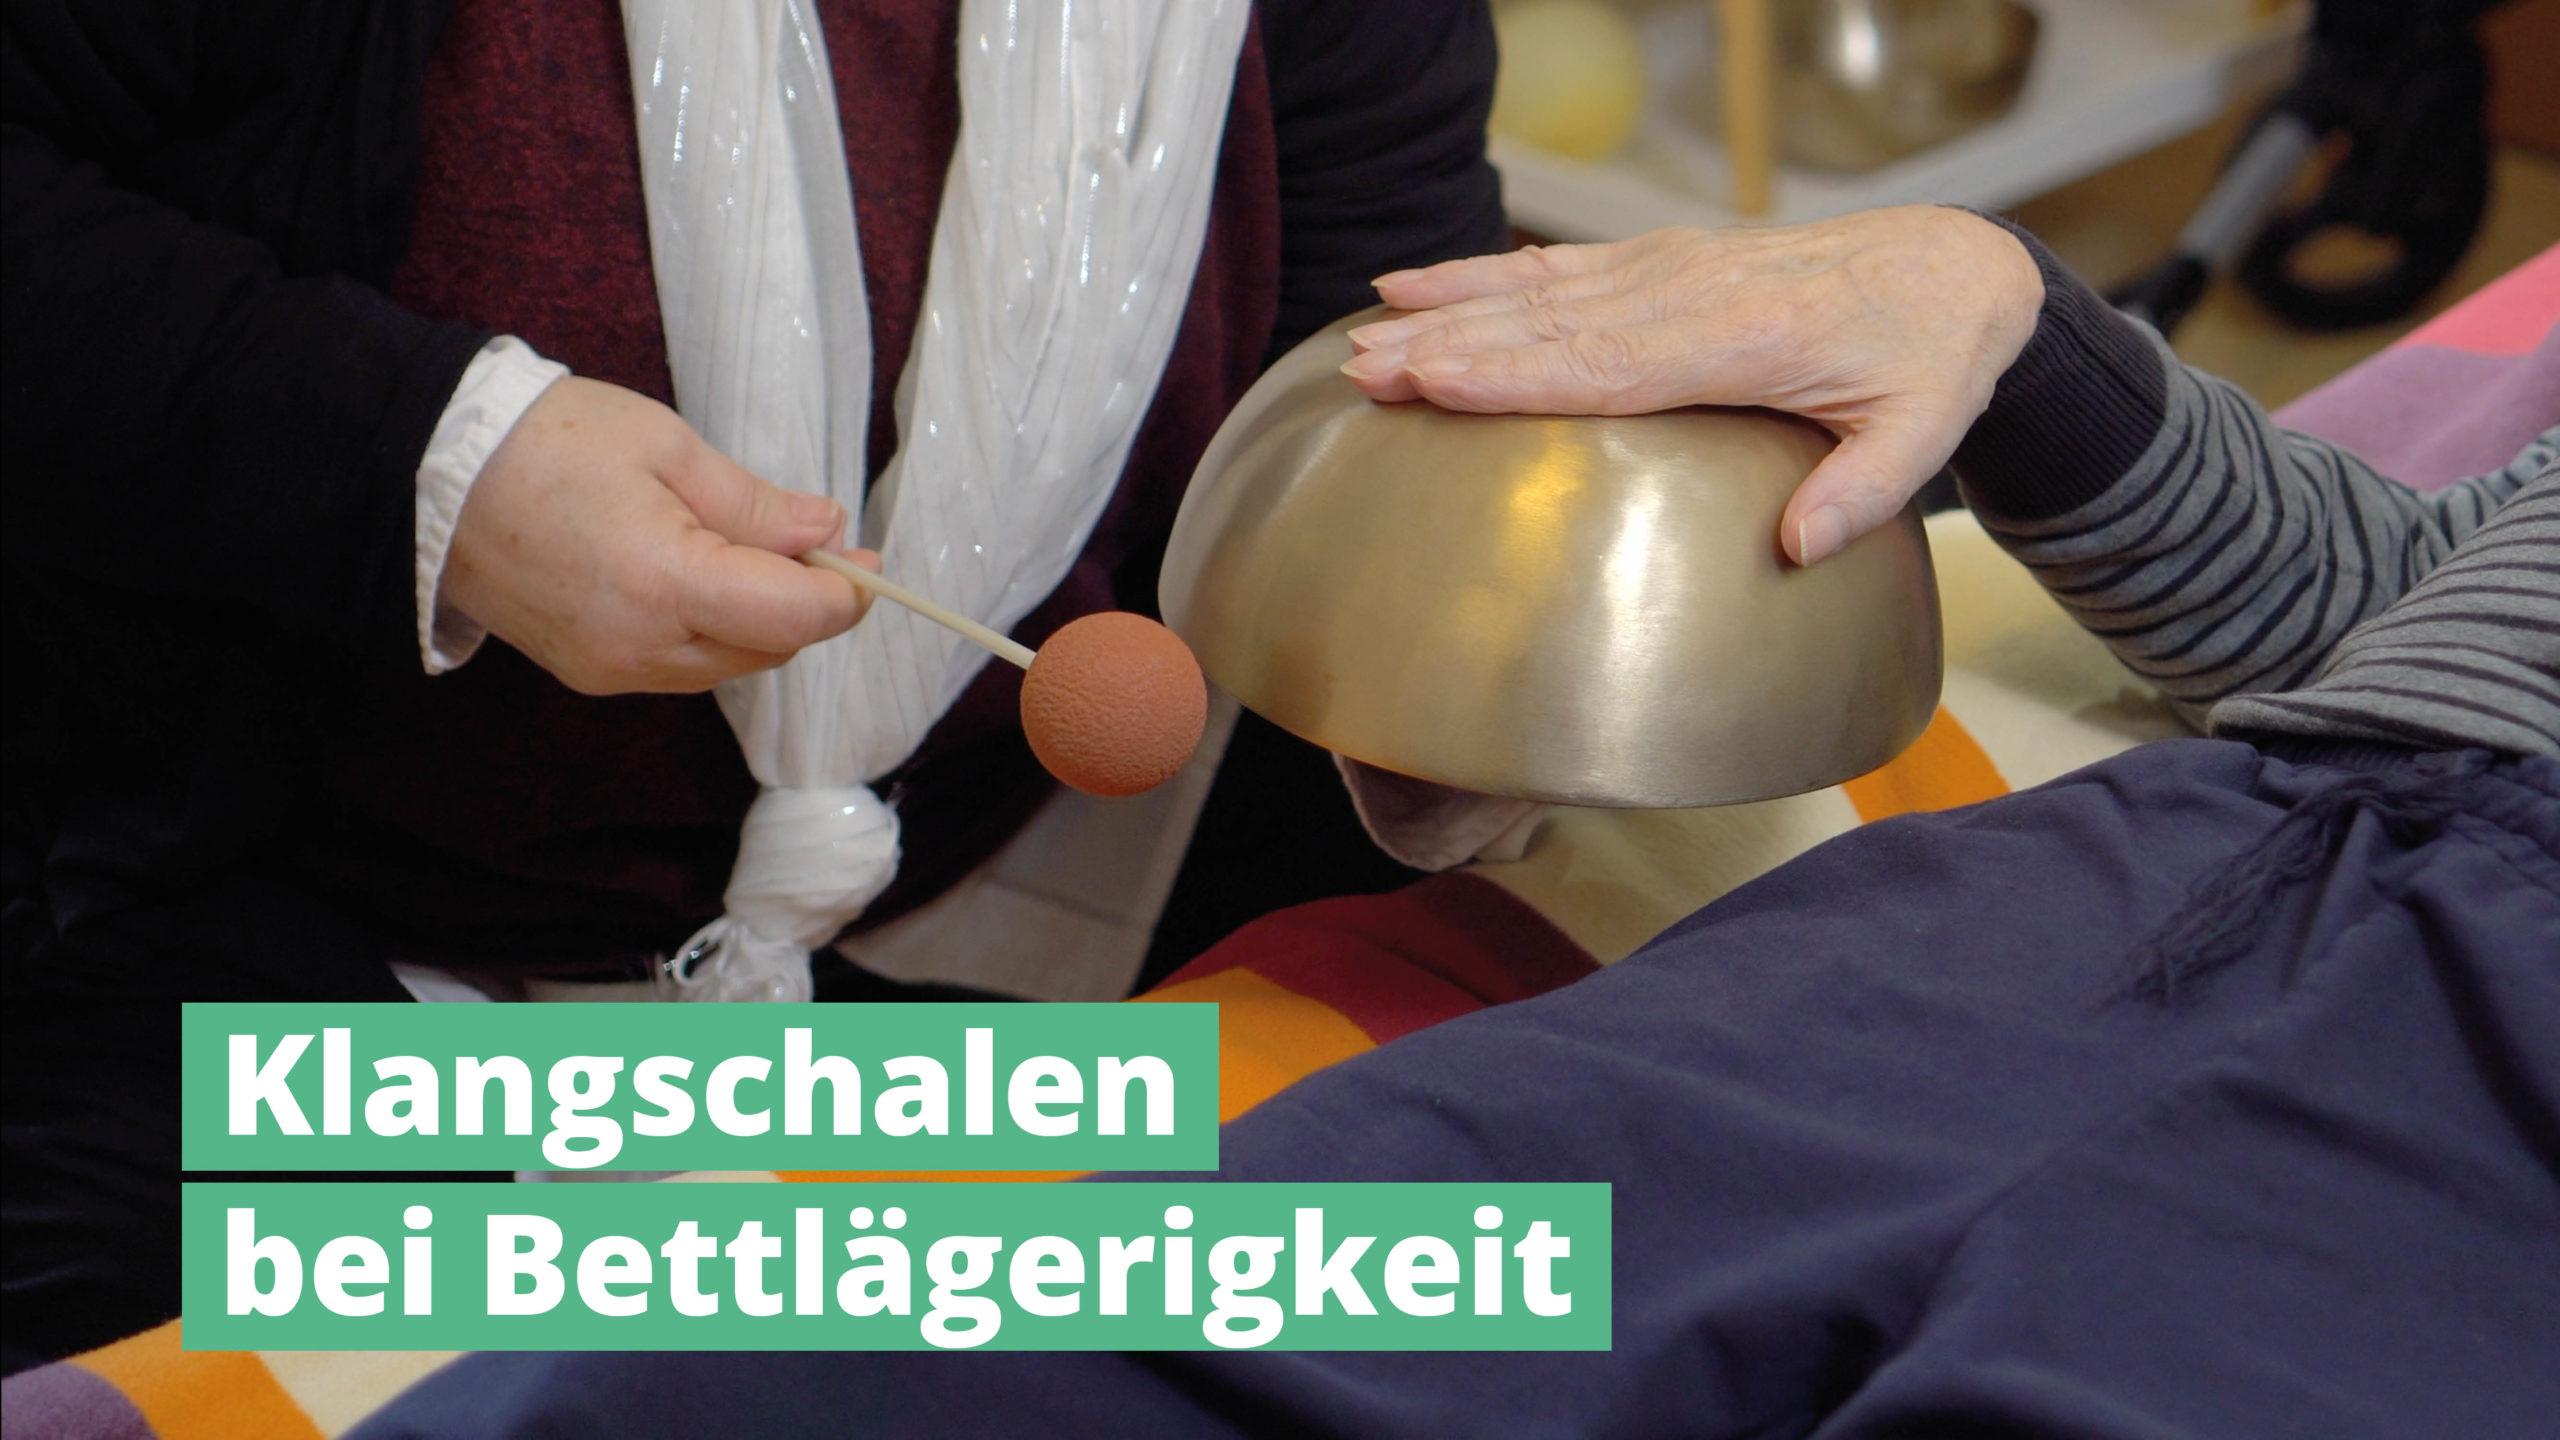 PeterHess Klangschalen bei Bettlägerigkeit Wir Sind Altenpflege